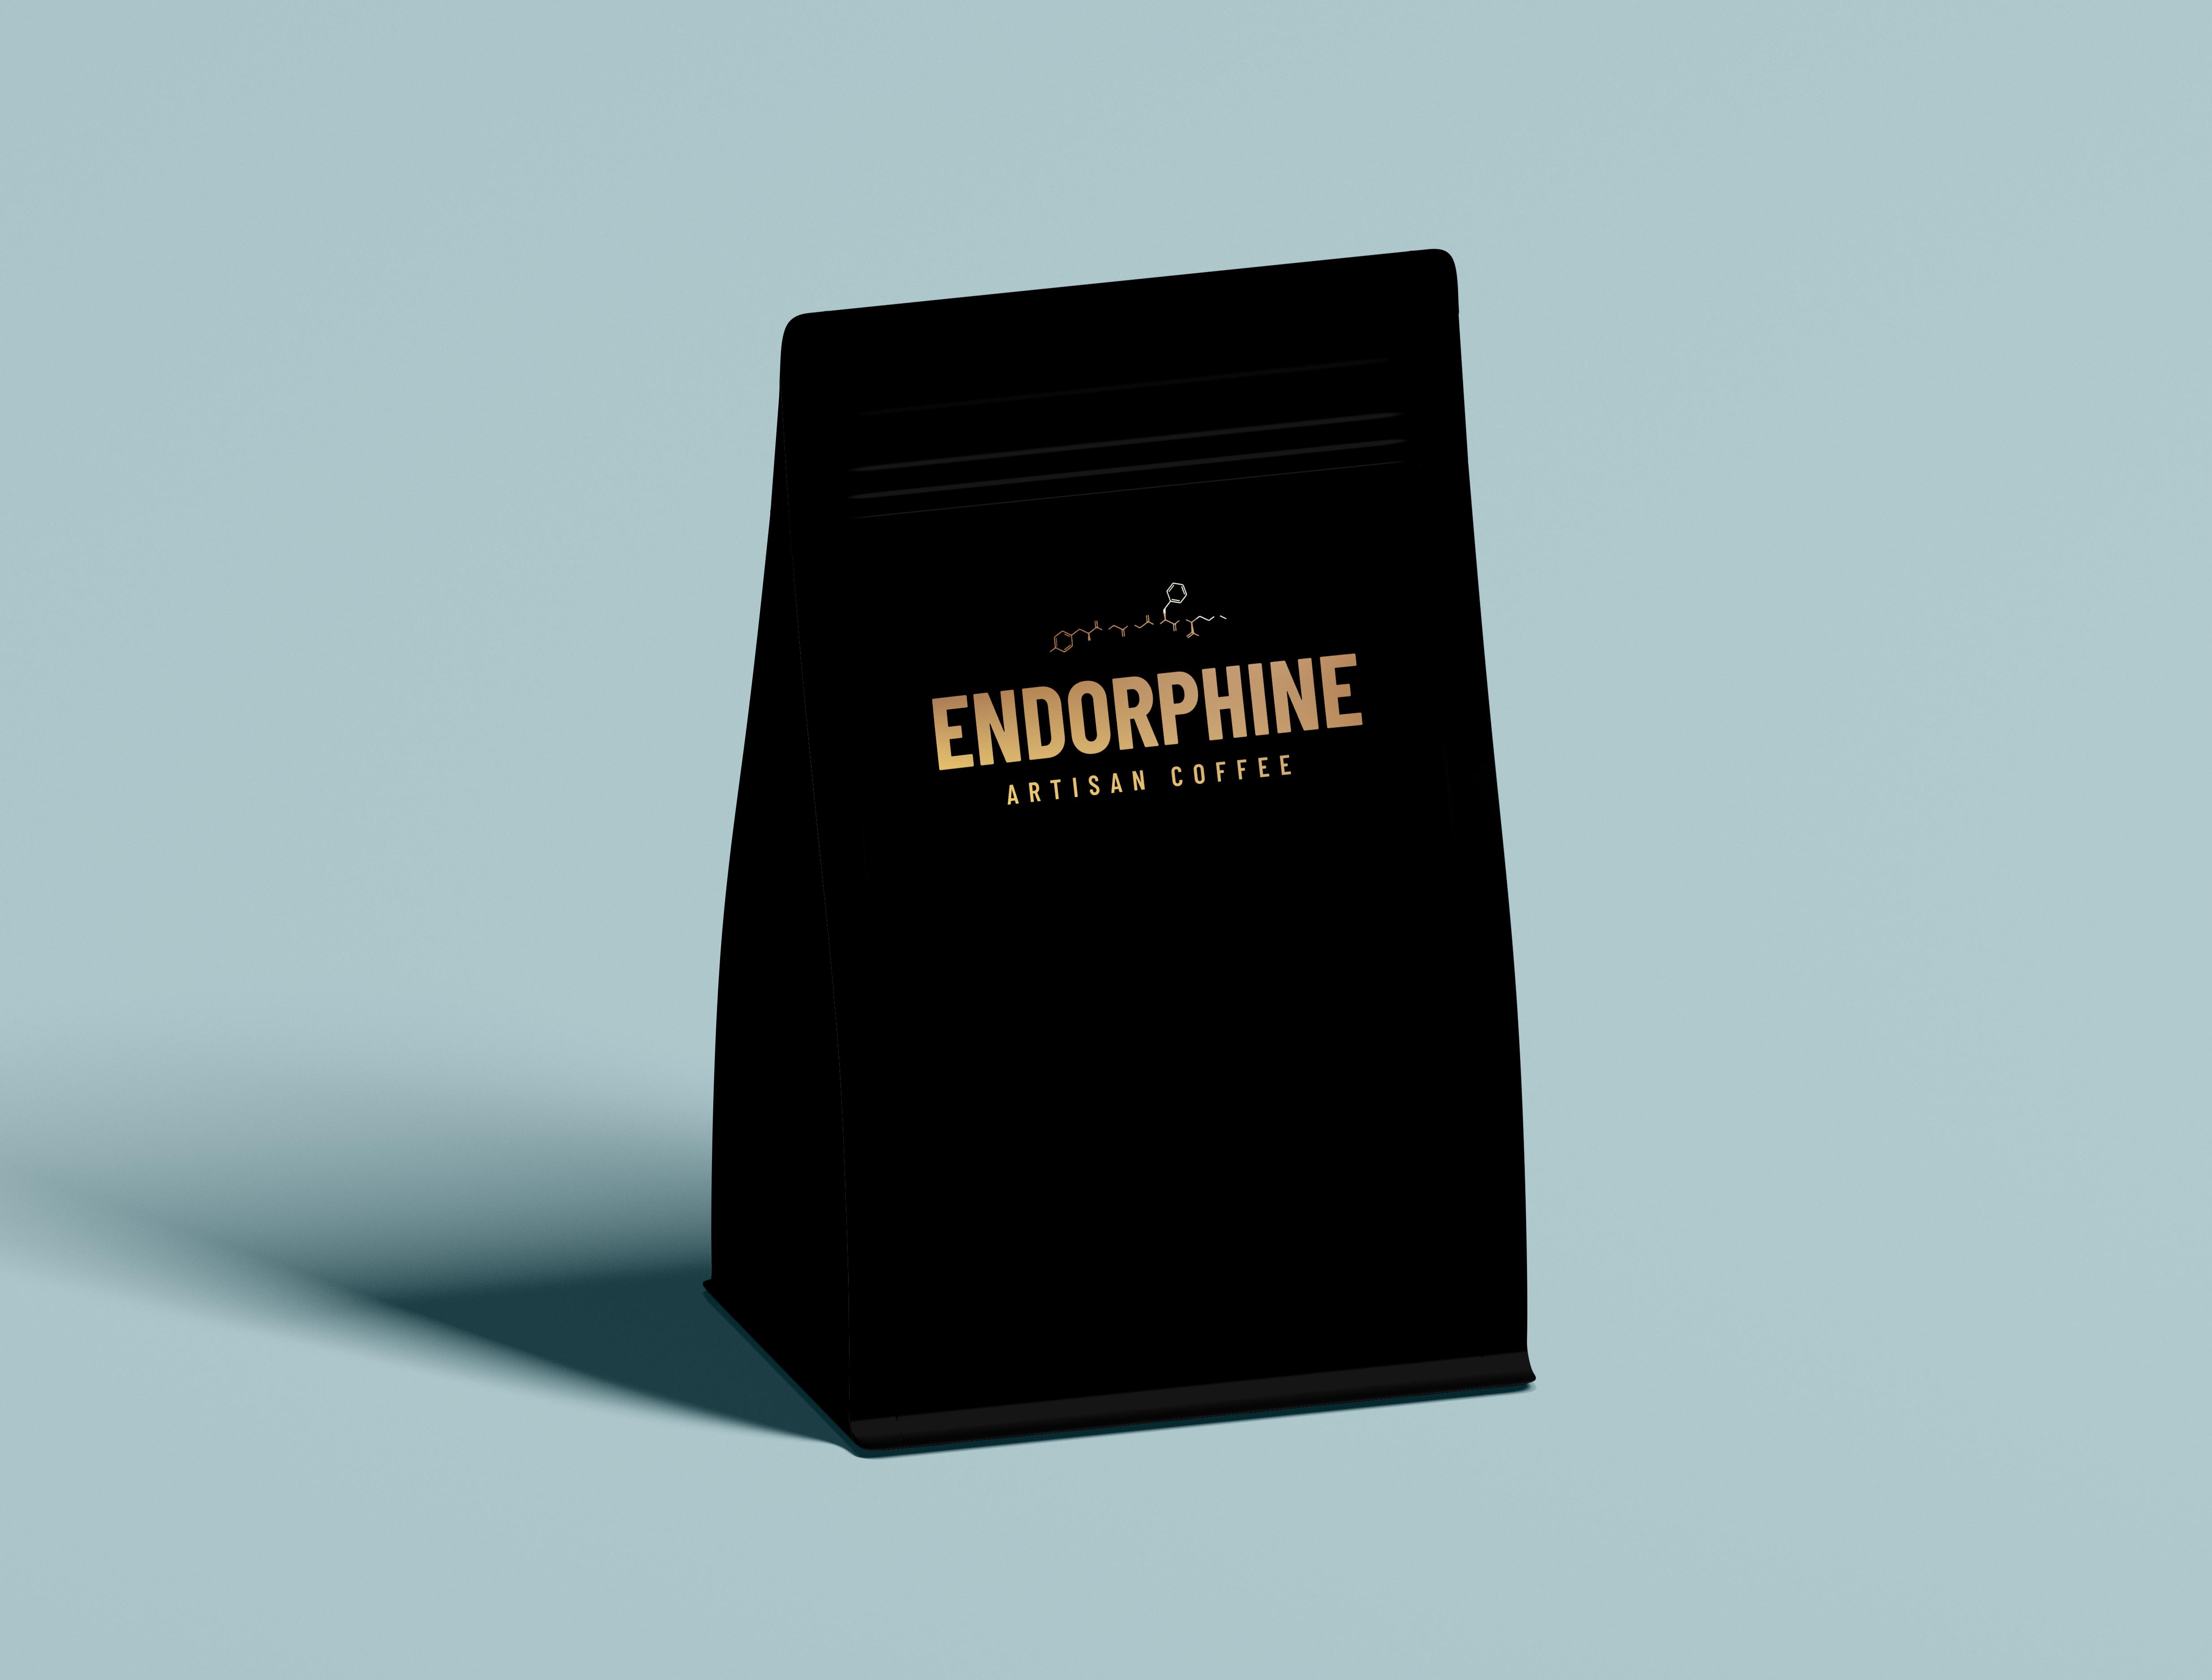 endorphine-mockup-fata